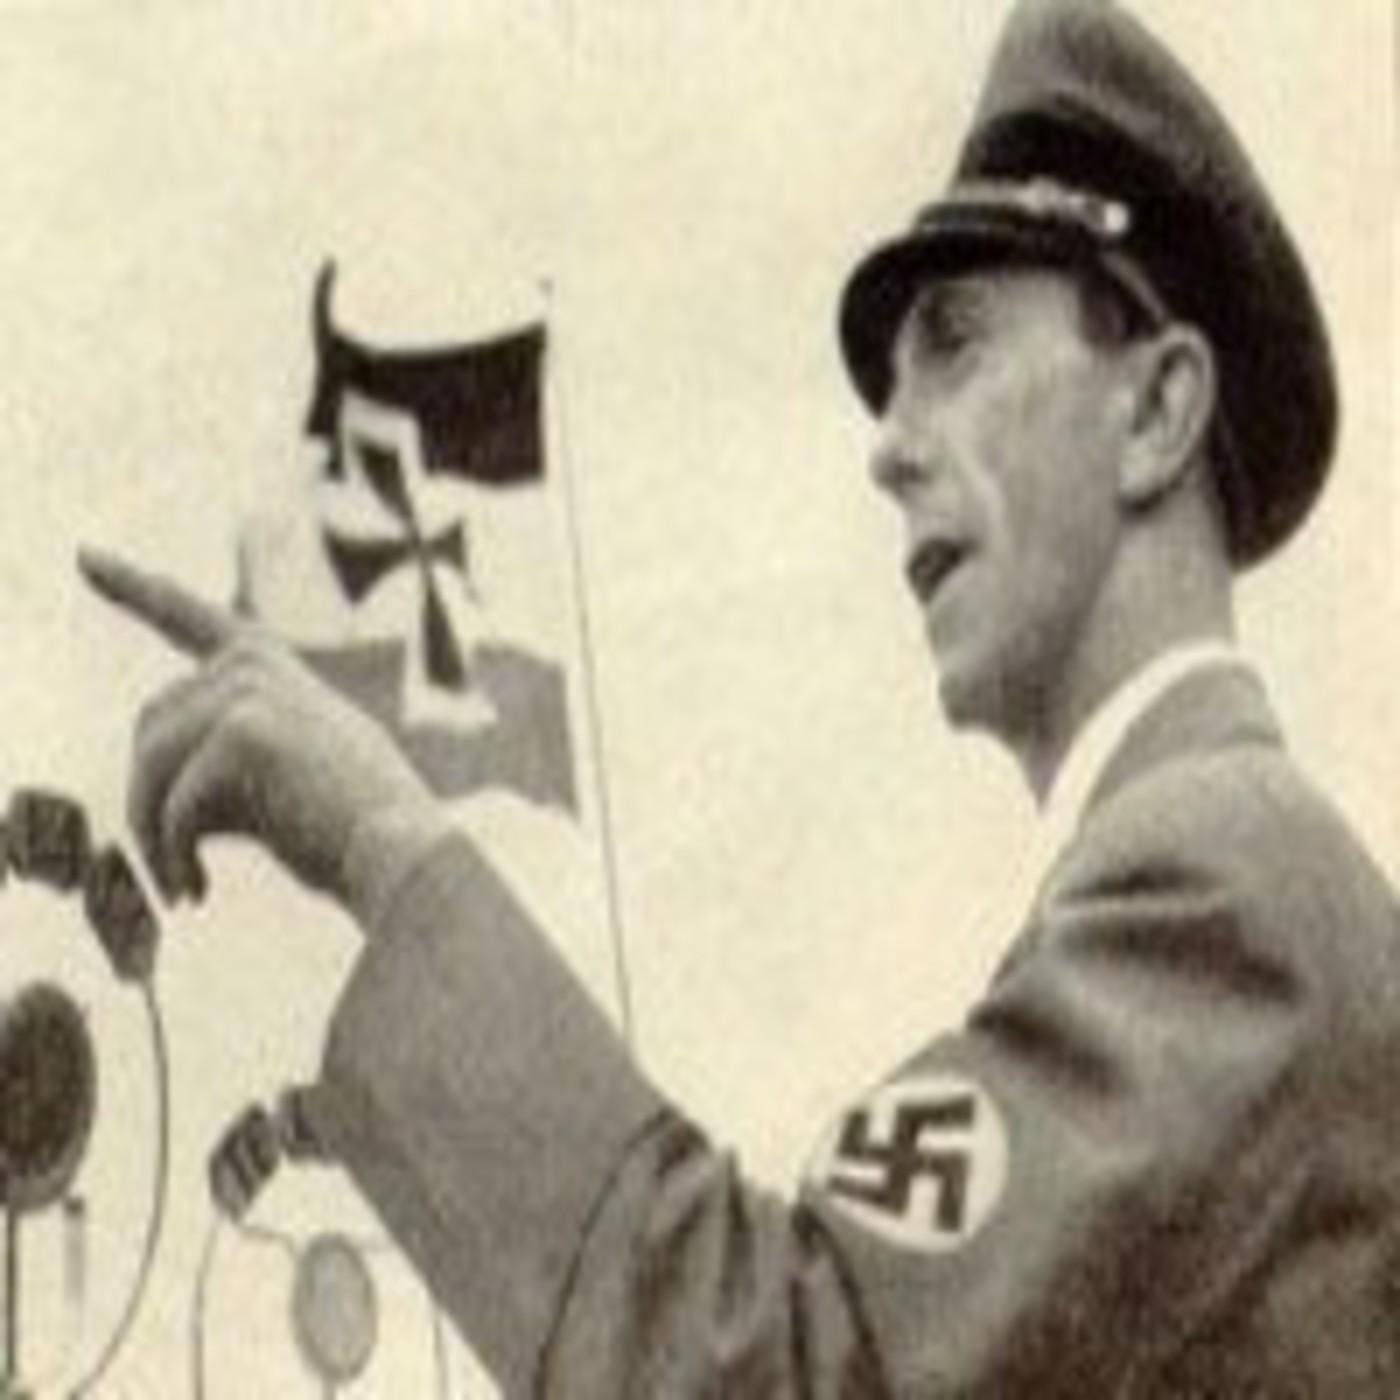 El Diario secreto de Joseph Goebbels